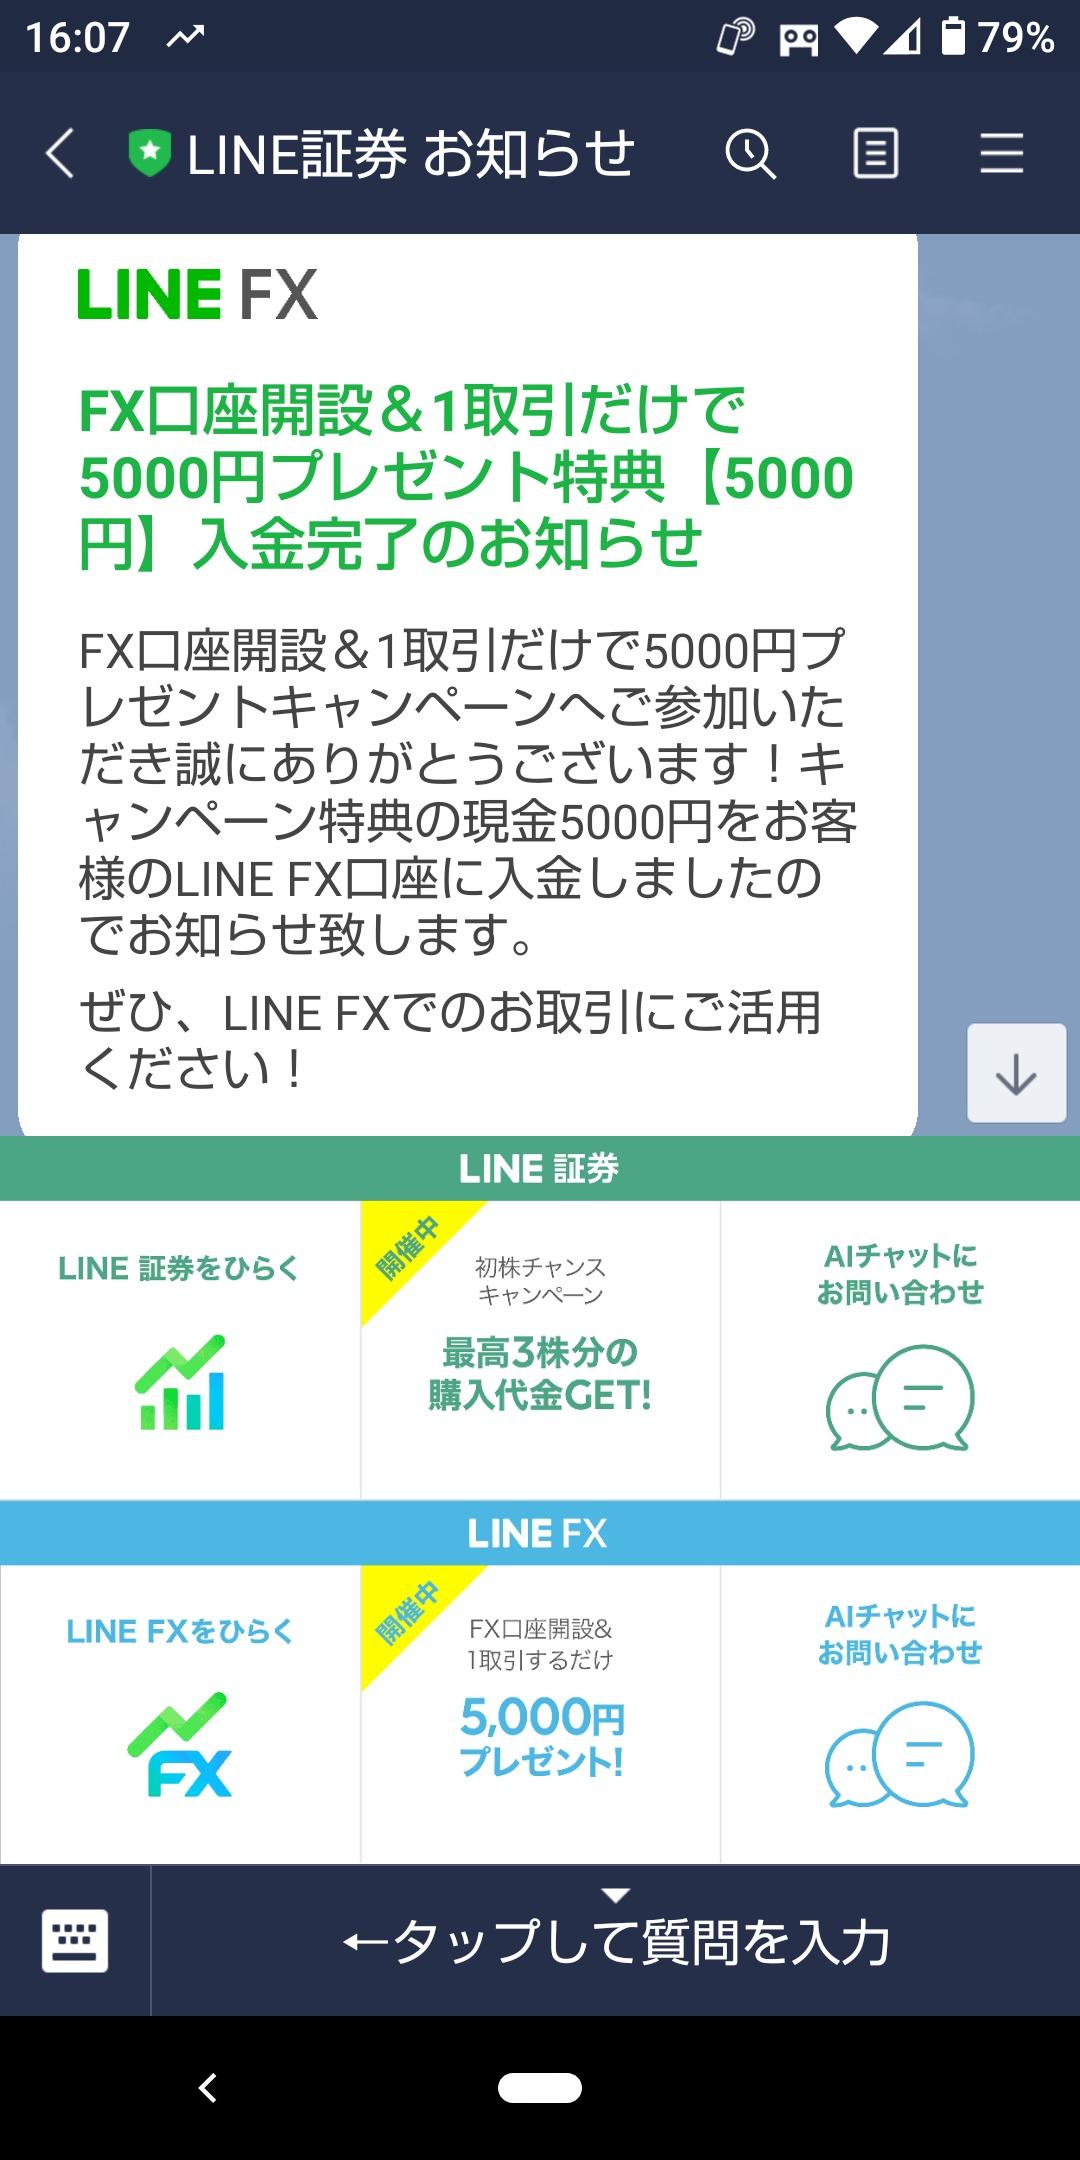 LINEFX入金